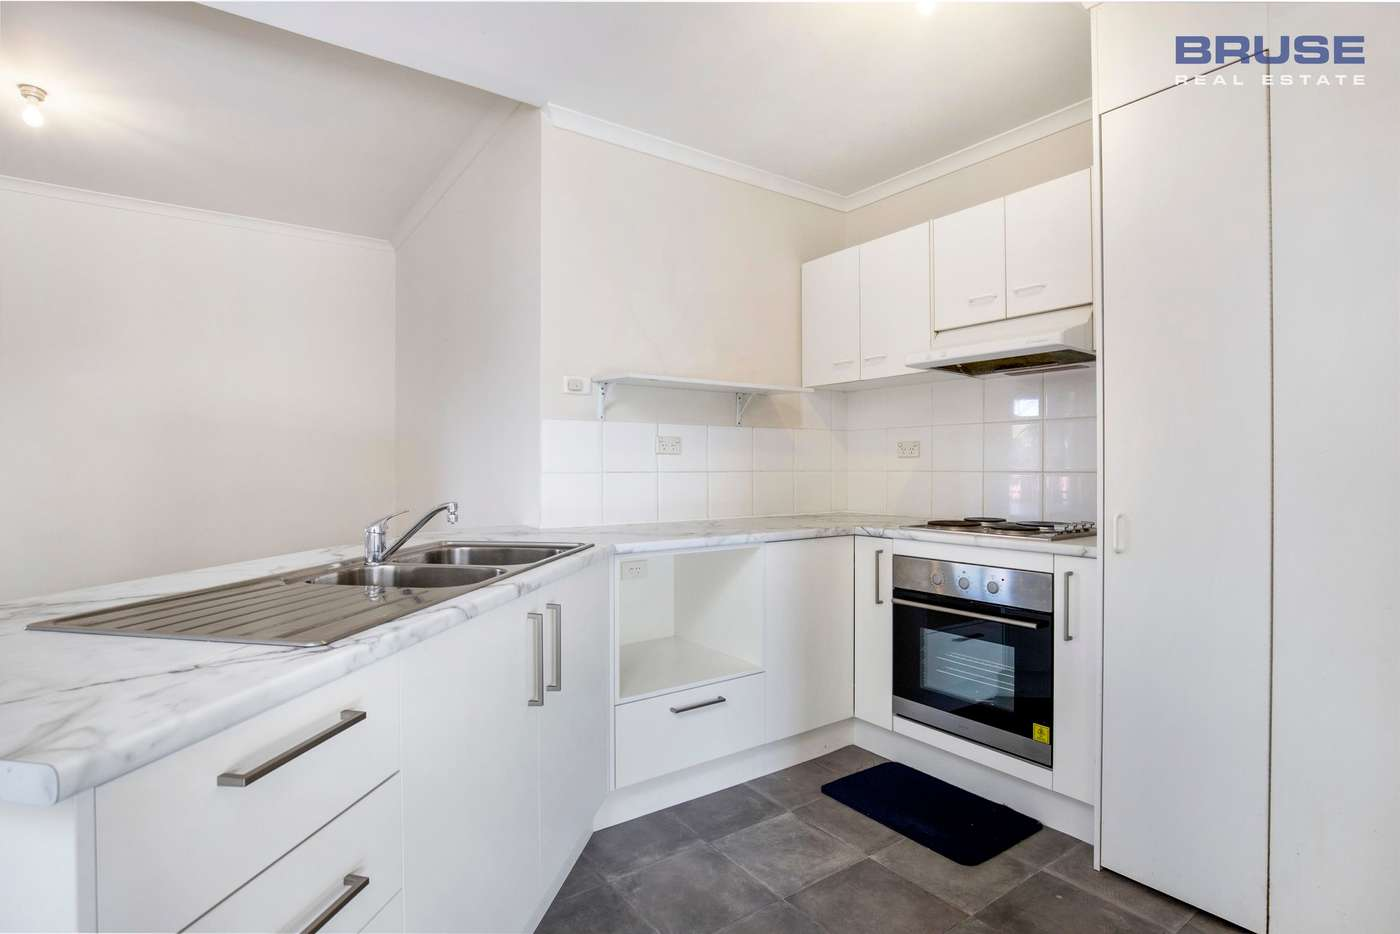 Sixth view of Homely apartment listing, 39/177 Angas Street, Adelaide SA 5000